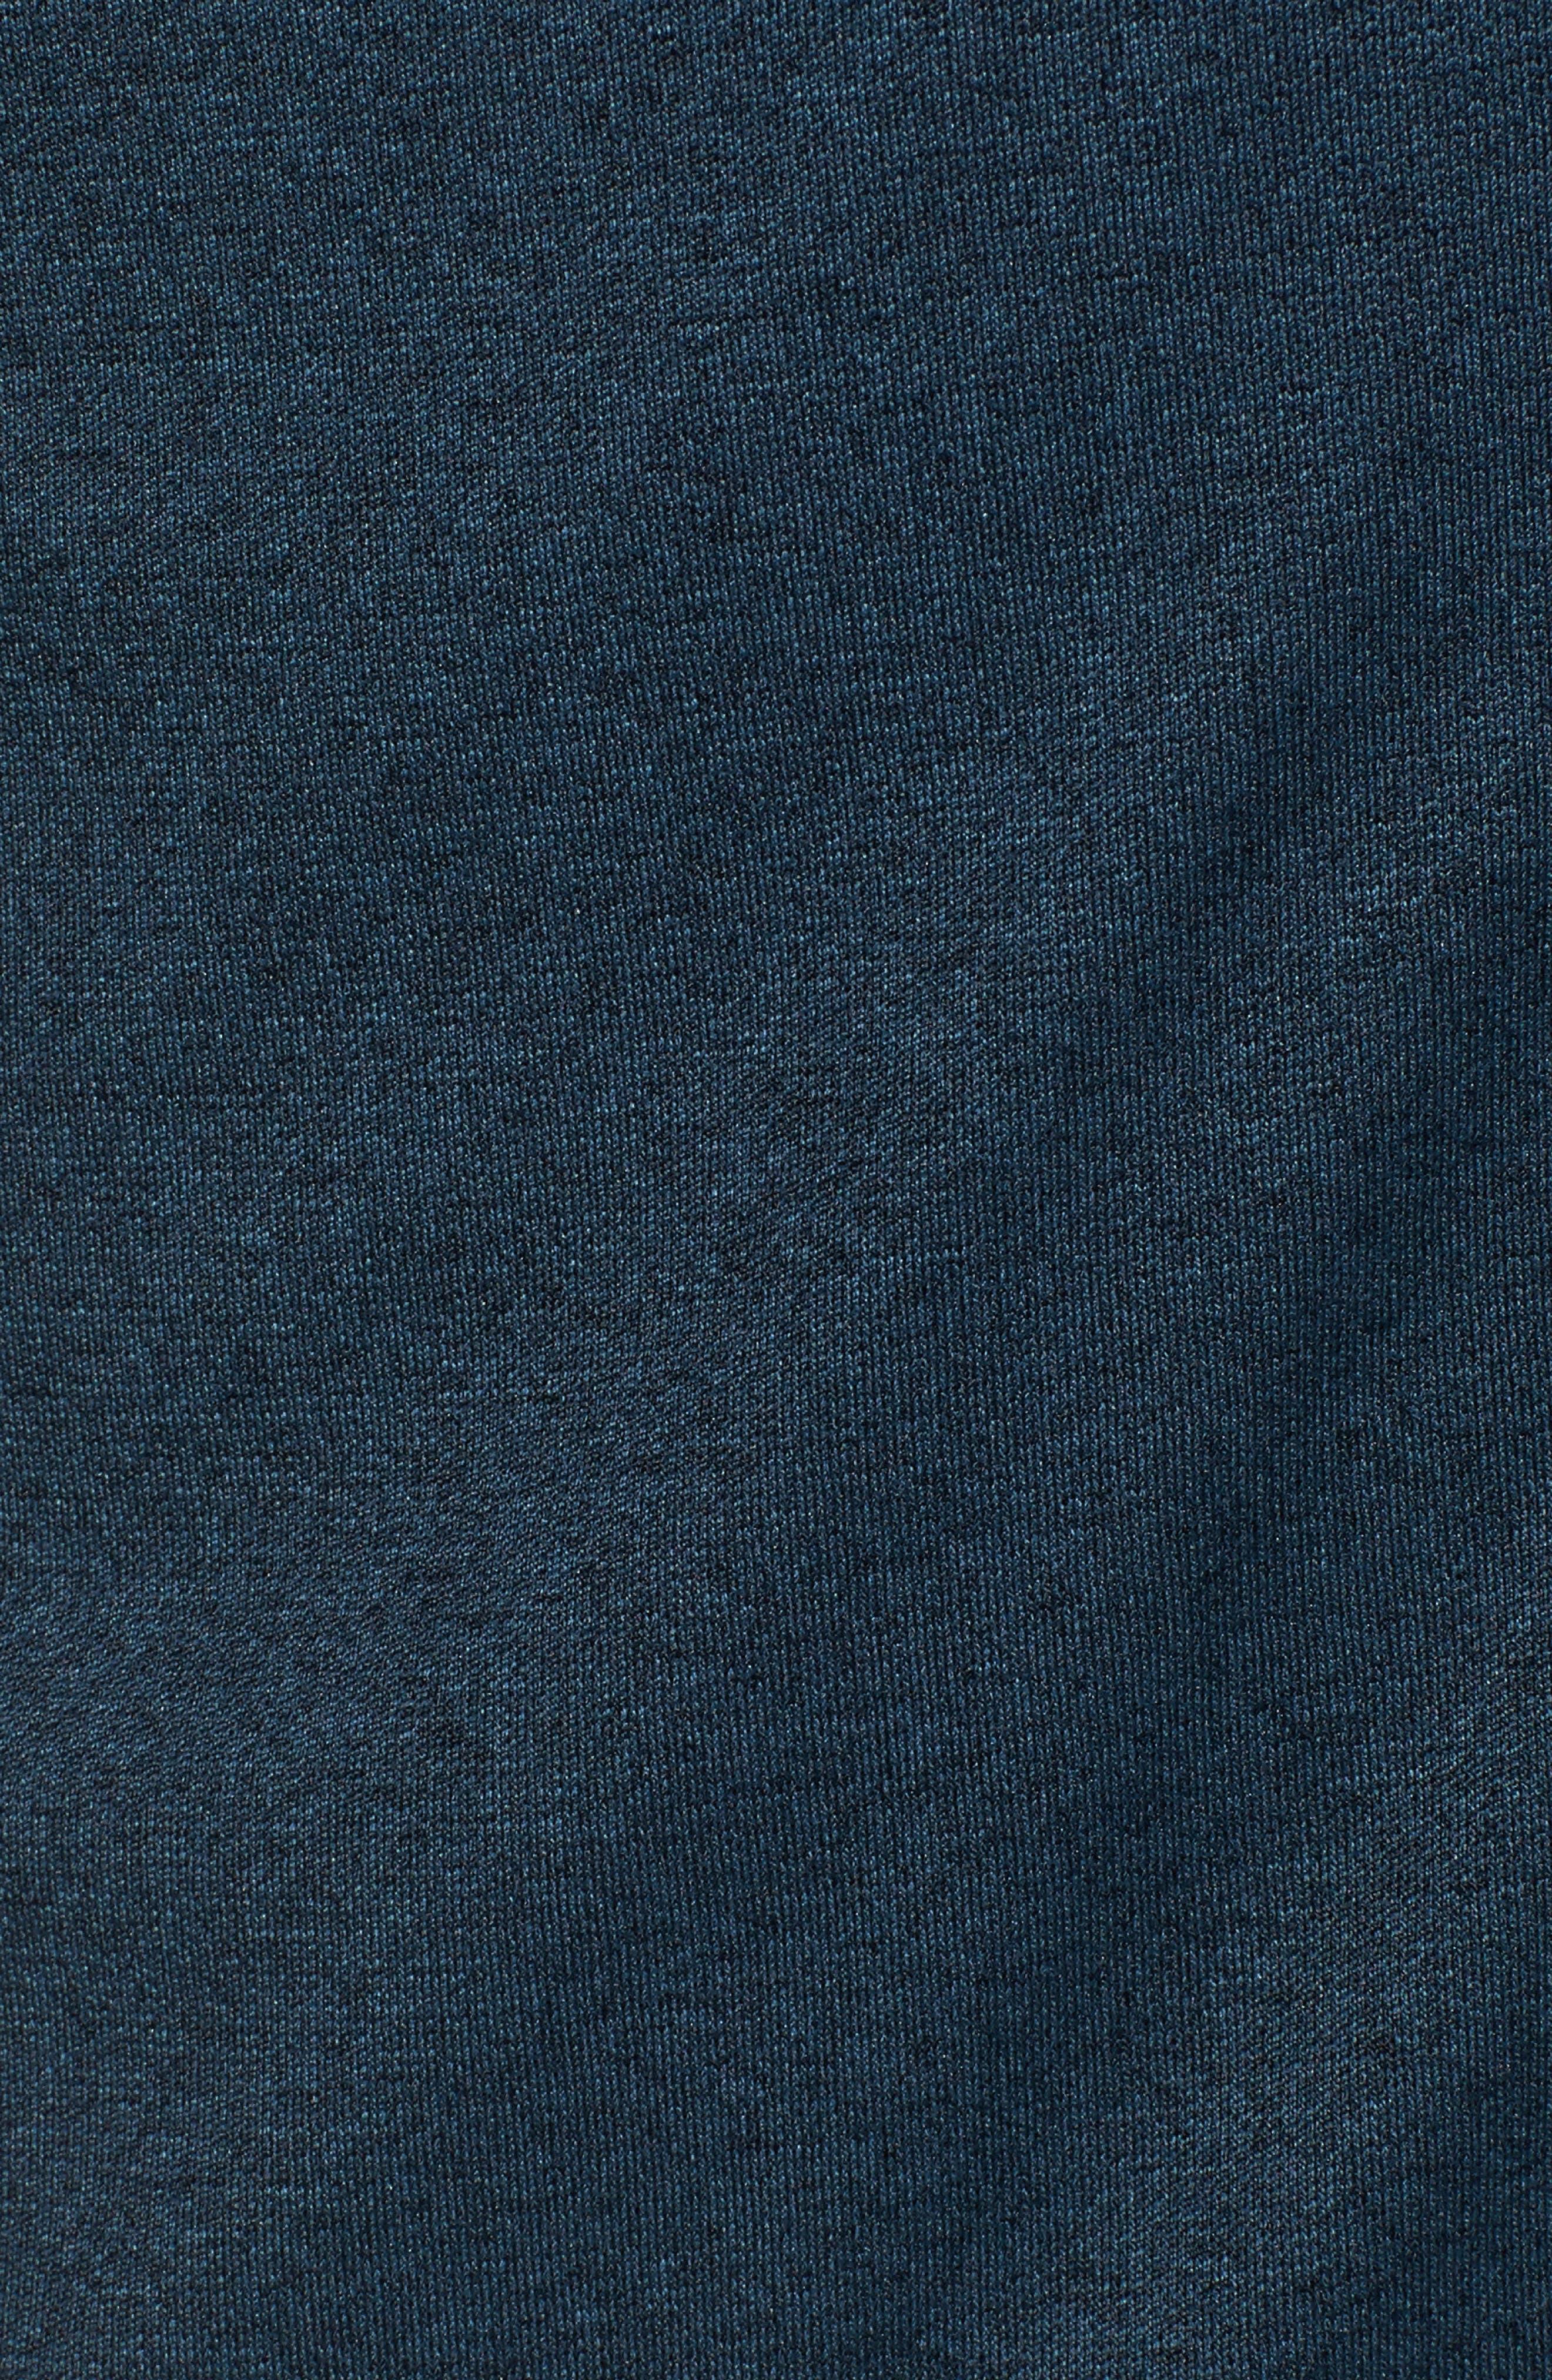 'Canyonlands' Jacket,                             Alternate thumbnail 19, color,